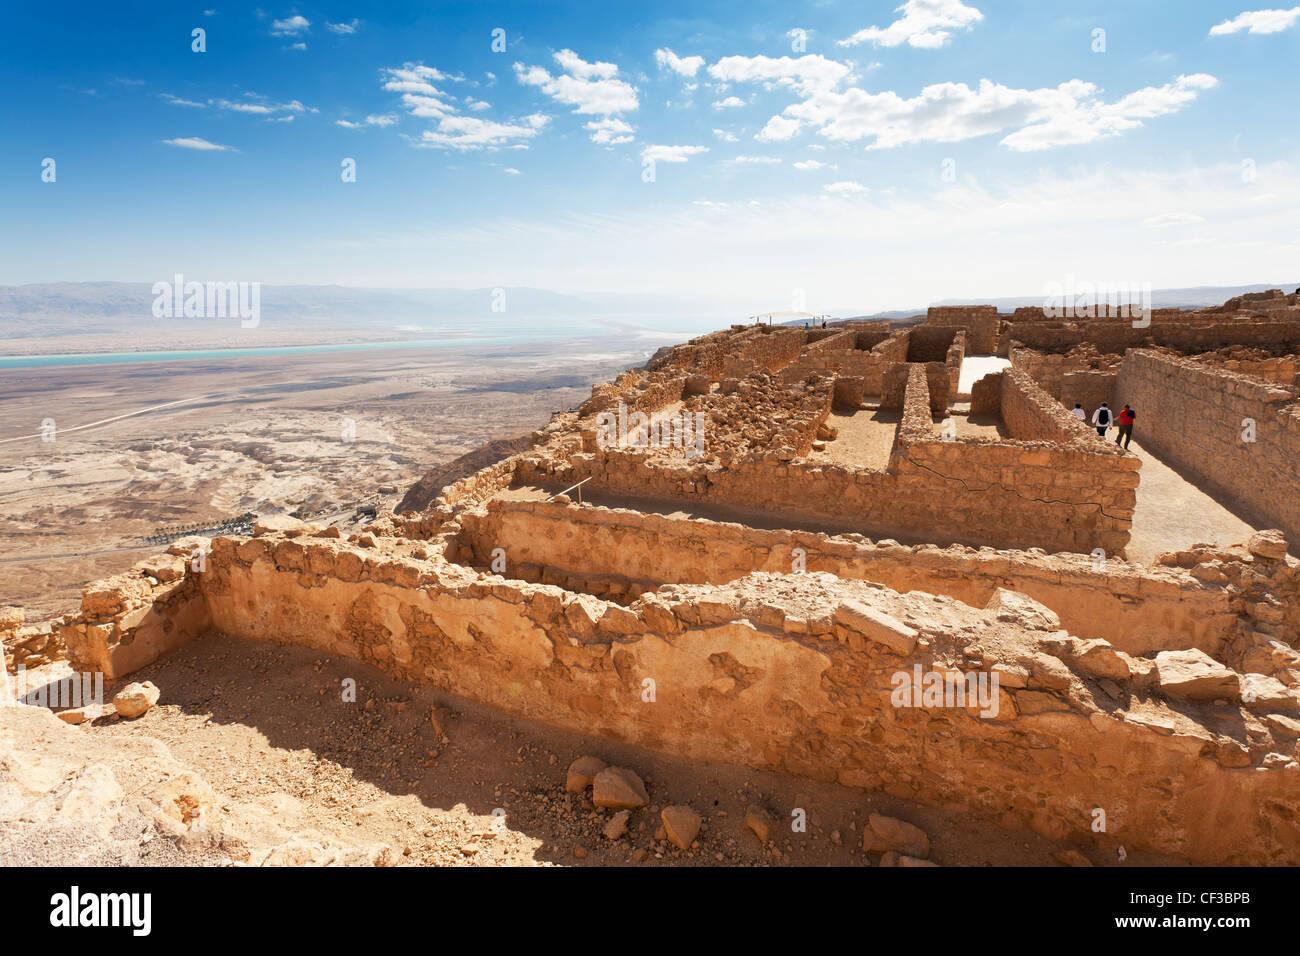 Israel, Masada fortress, the storerooms and surrounding desert Stock Photo